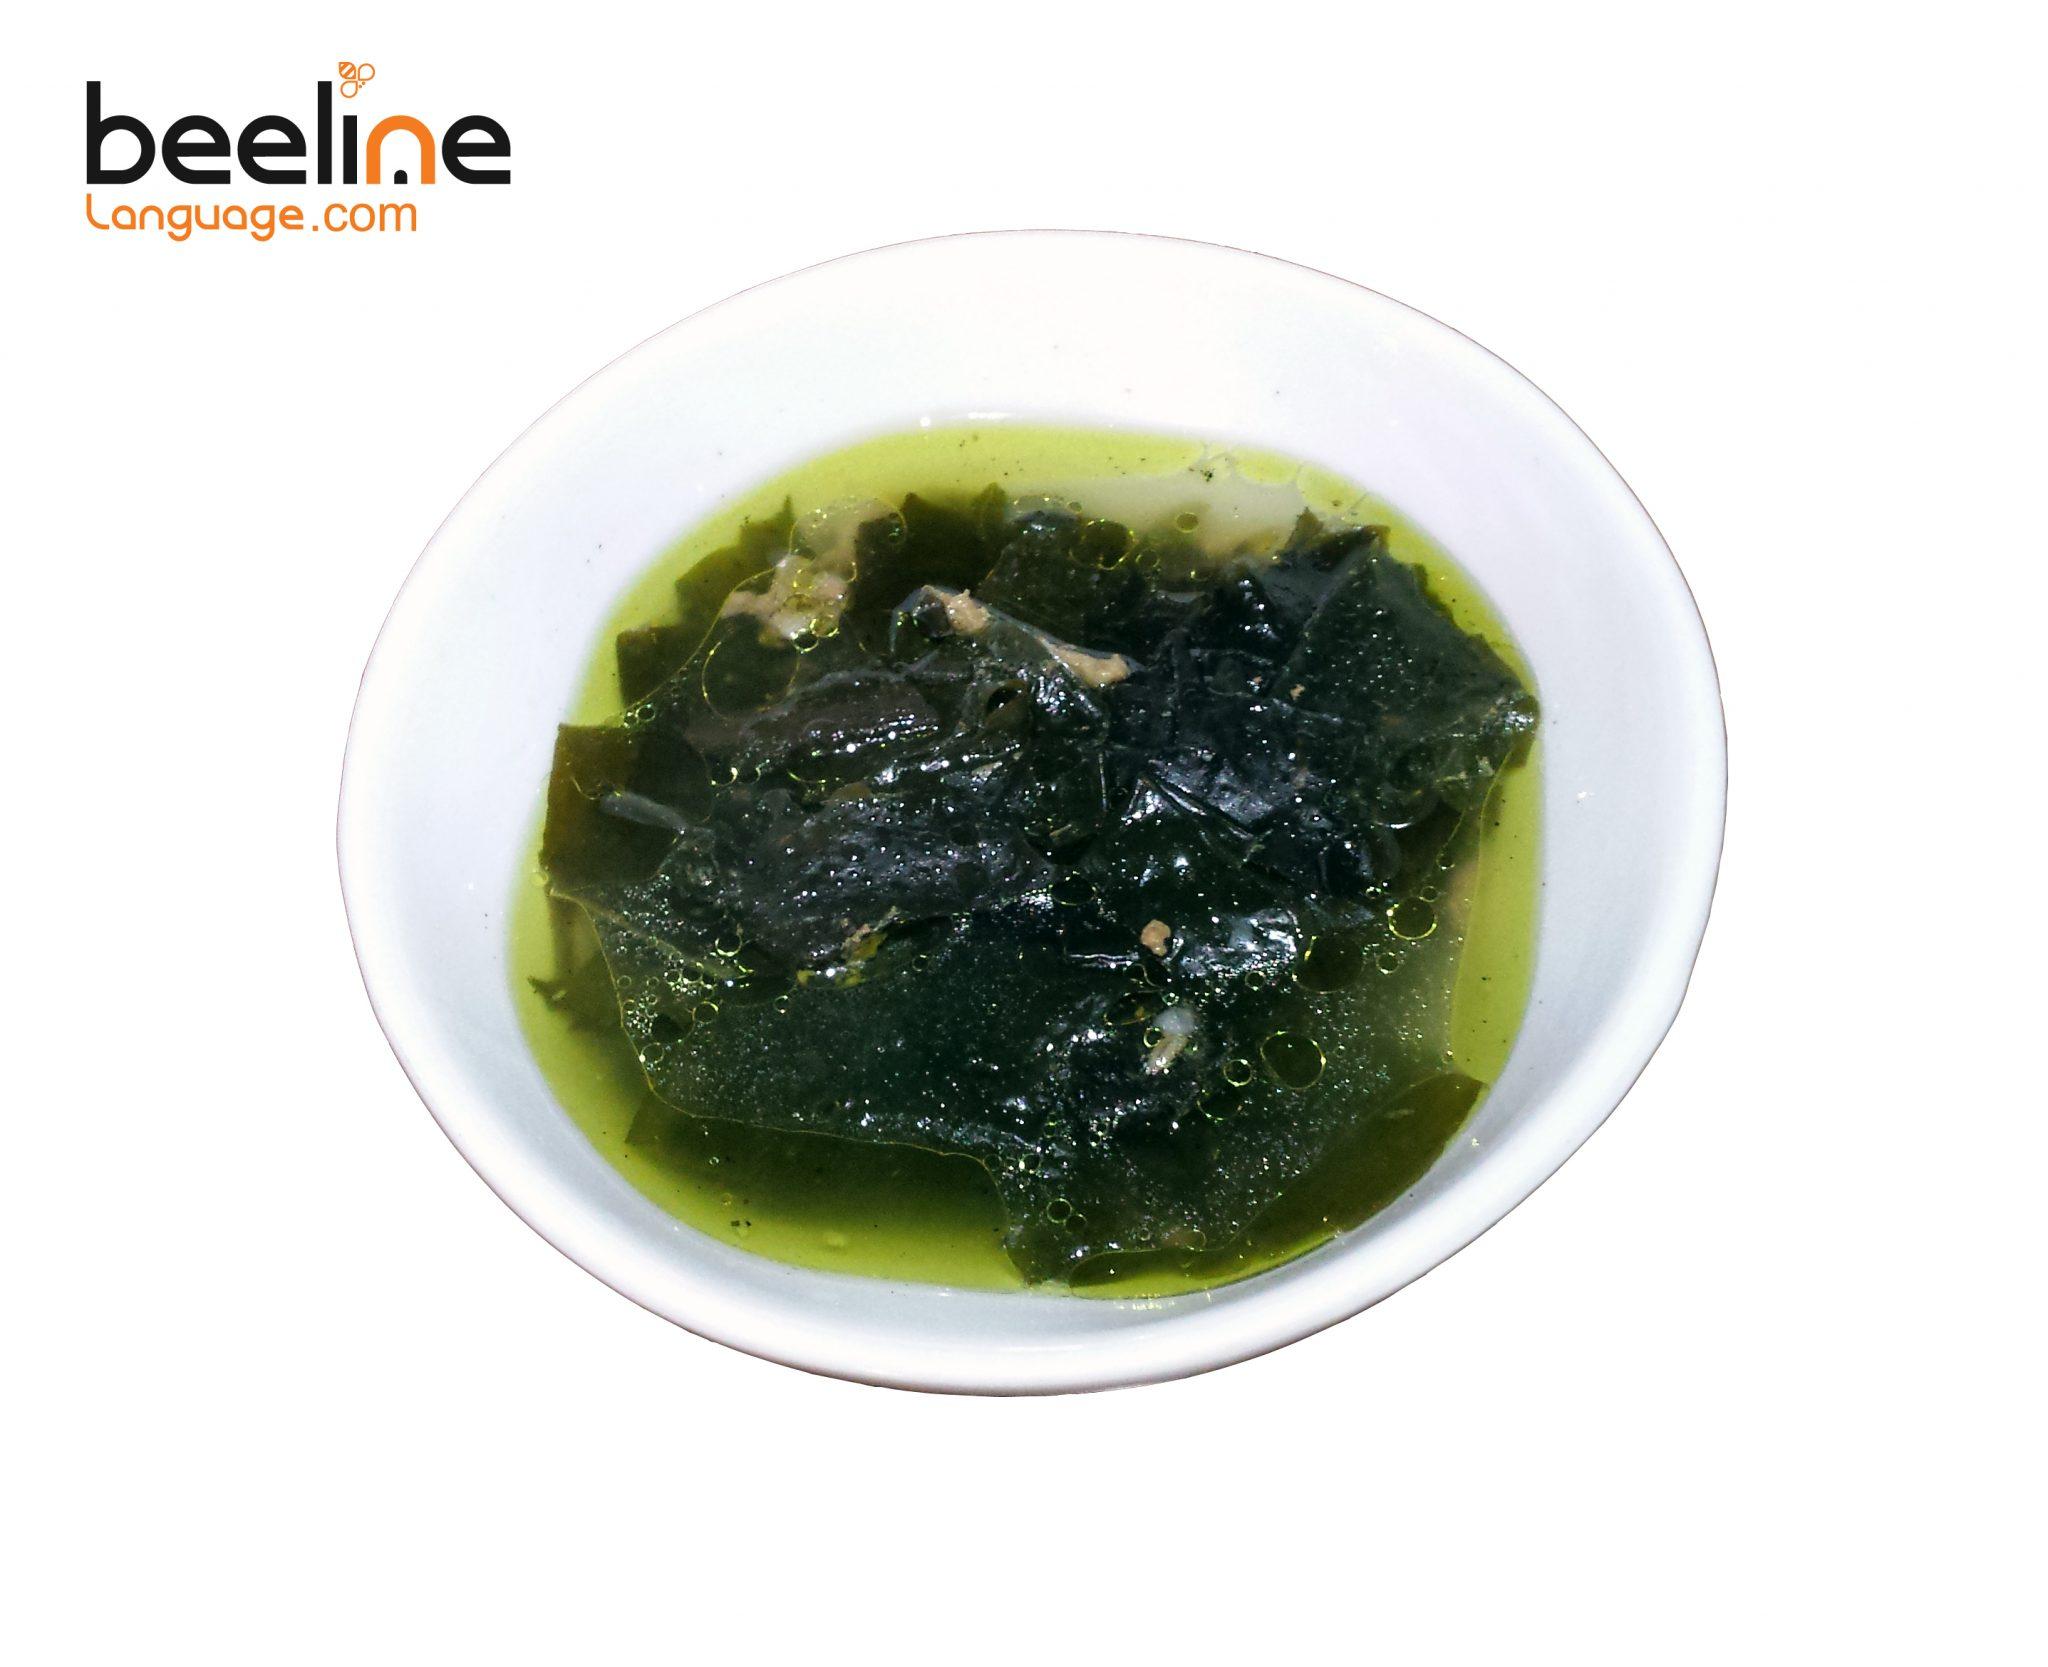 why koreans eat seaweed soup on their birthday